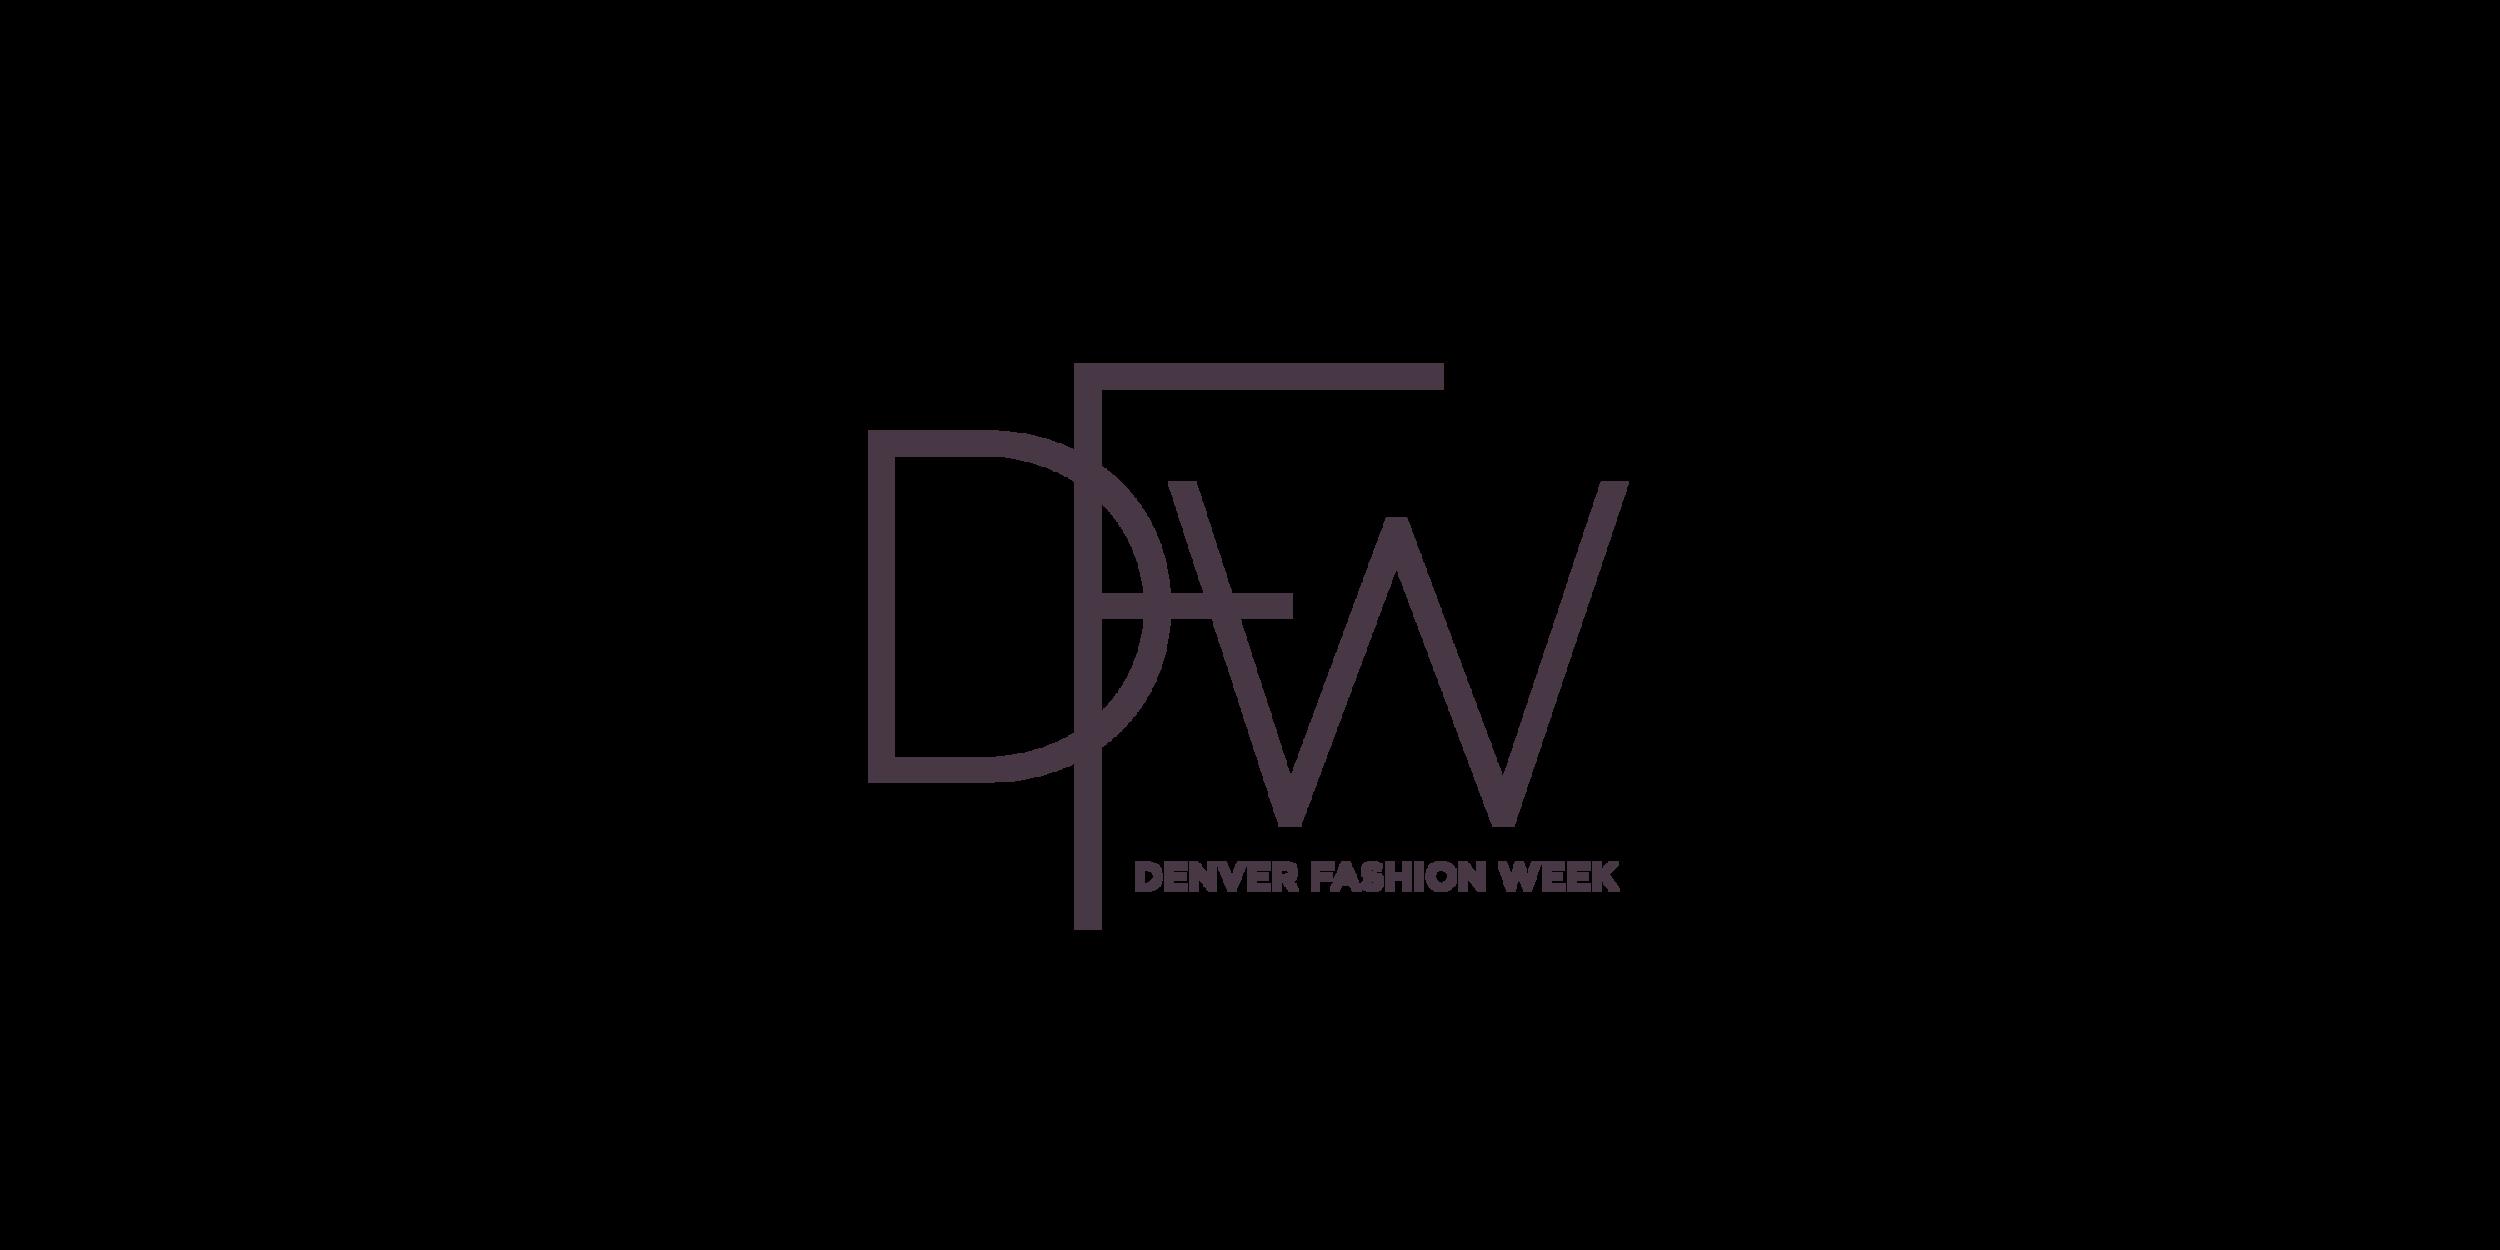 LBD_Carousel_Logo_DFW-01.png